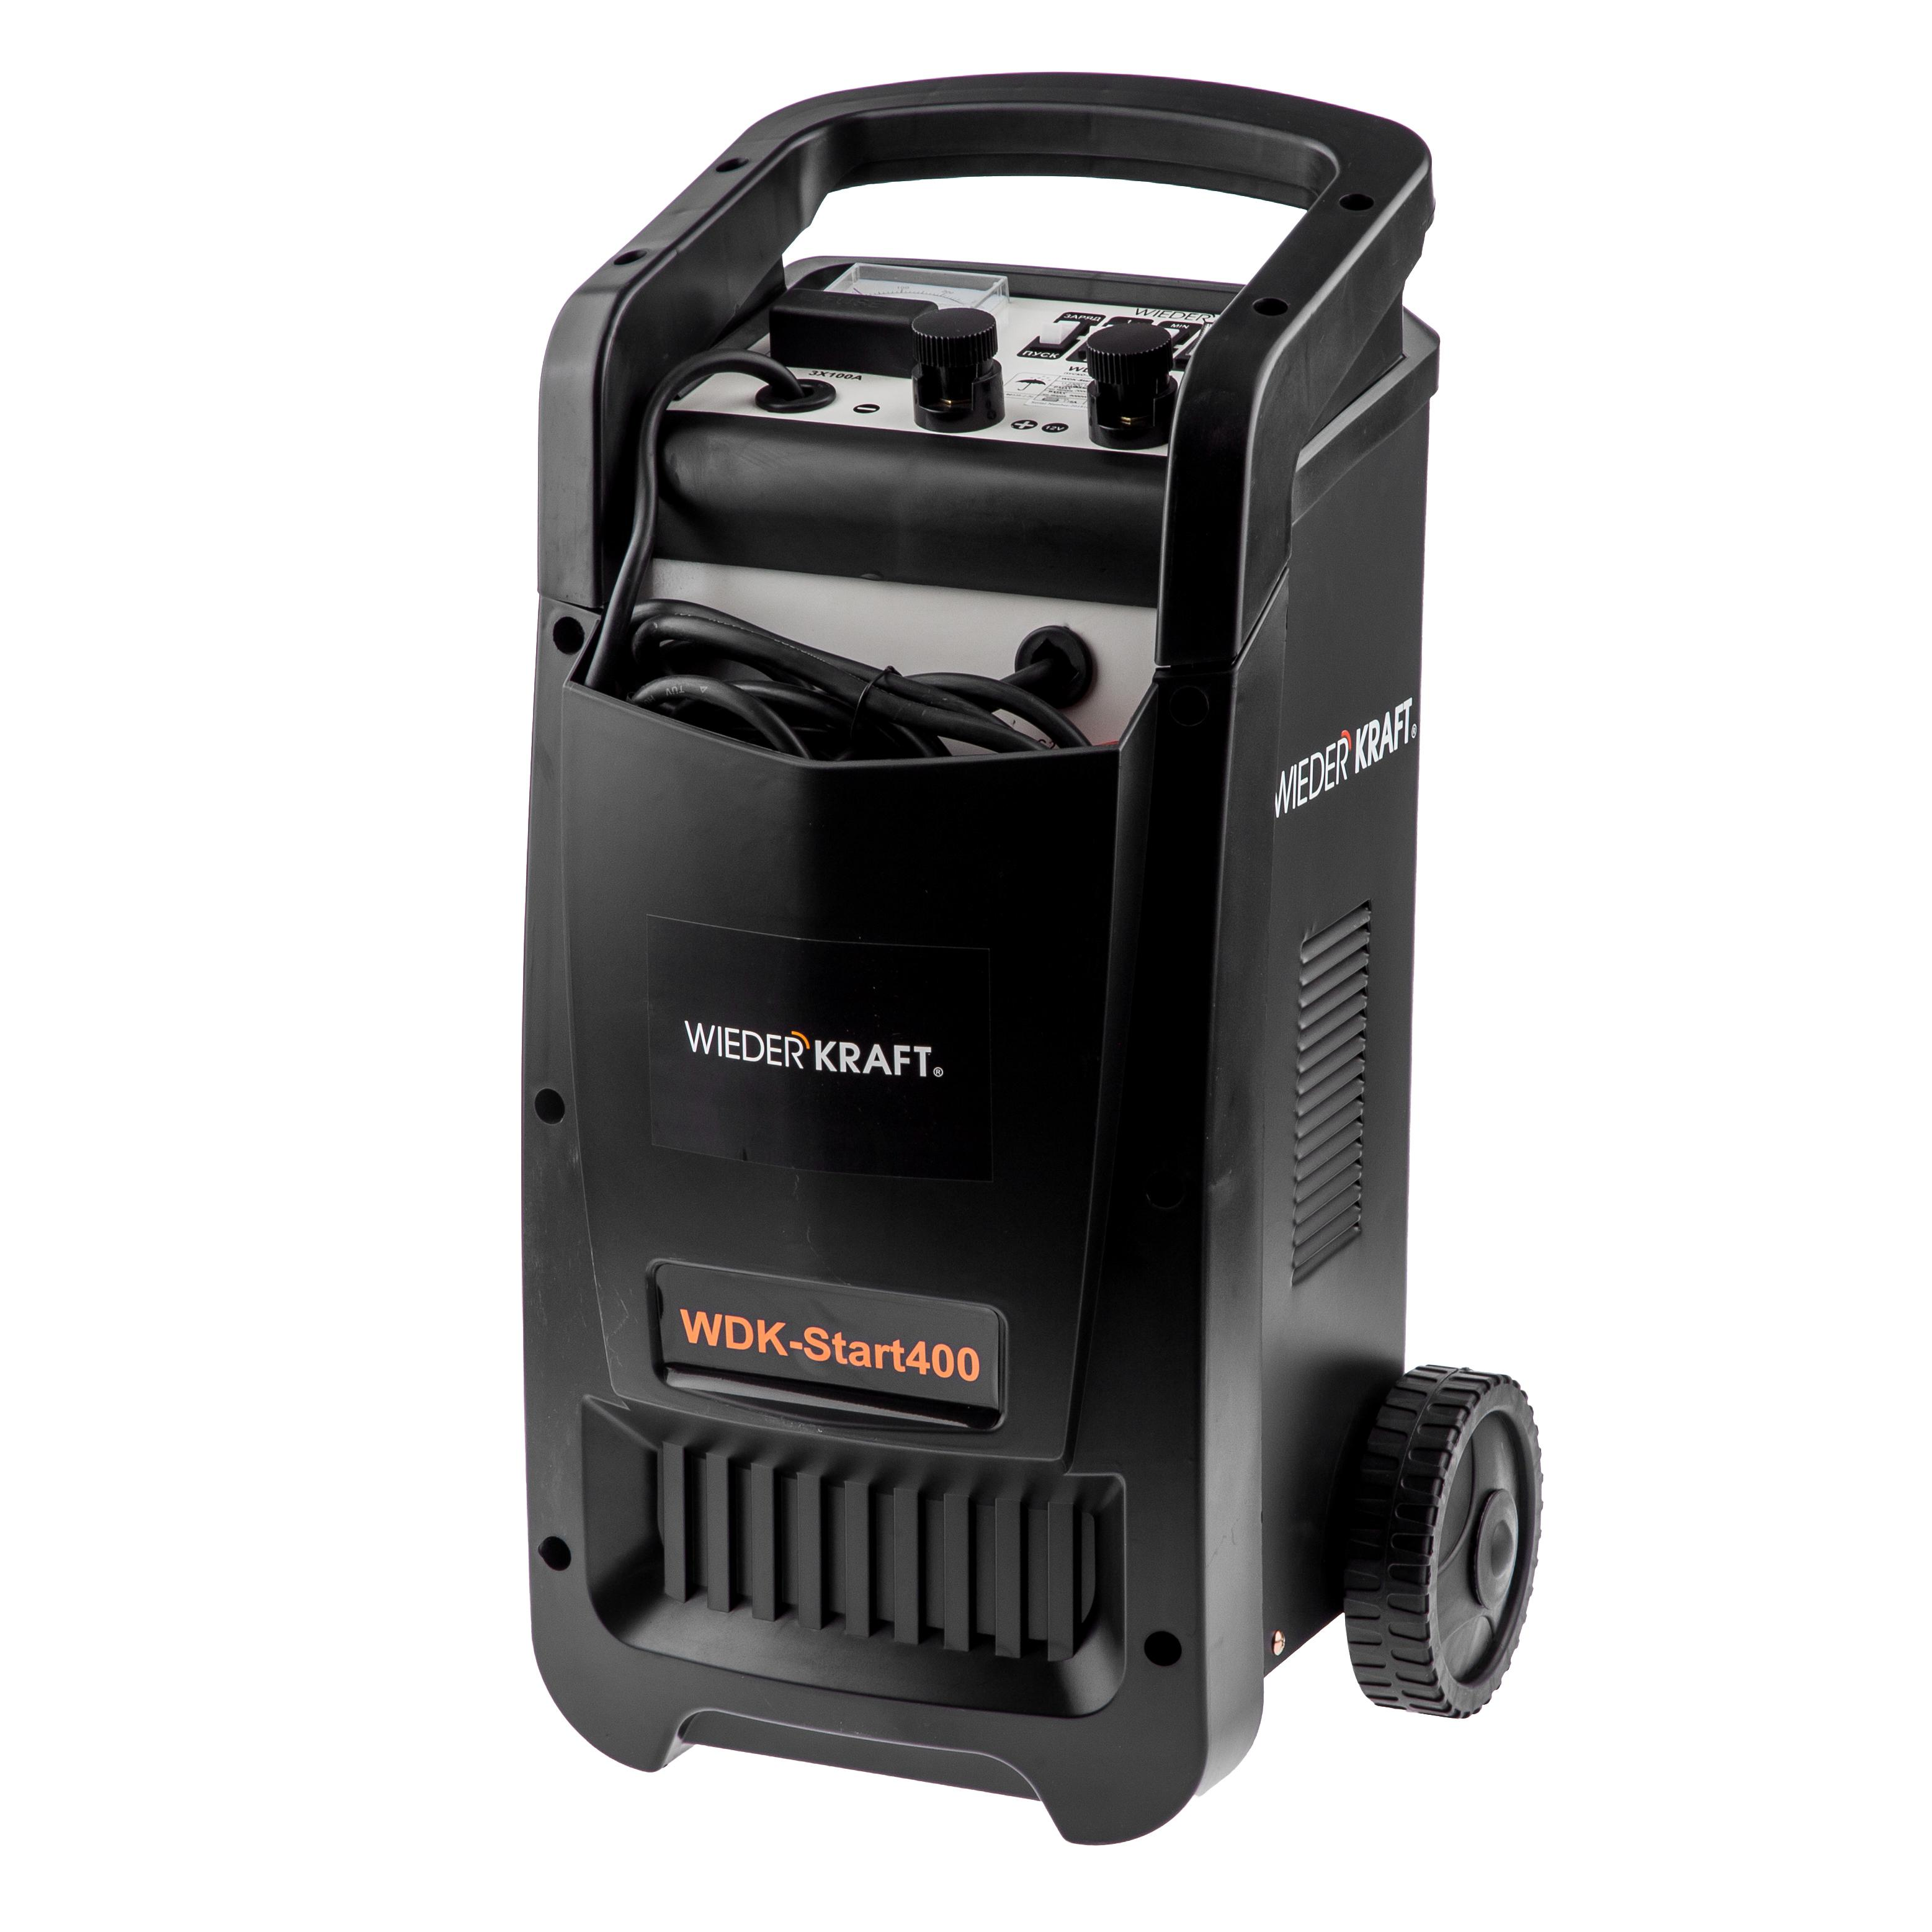 Устройство пуско-зарядное Wiederkraft Wdk-start400 пуско зарядное устройство с компрессором каркам пзу 10